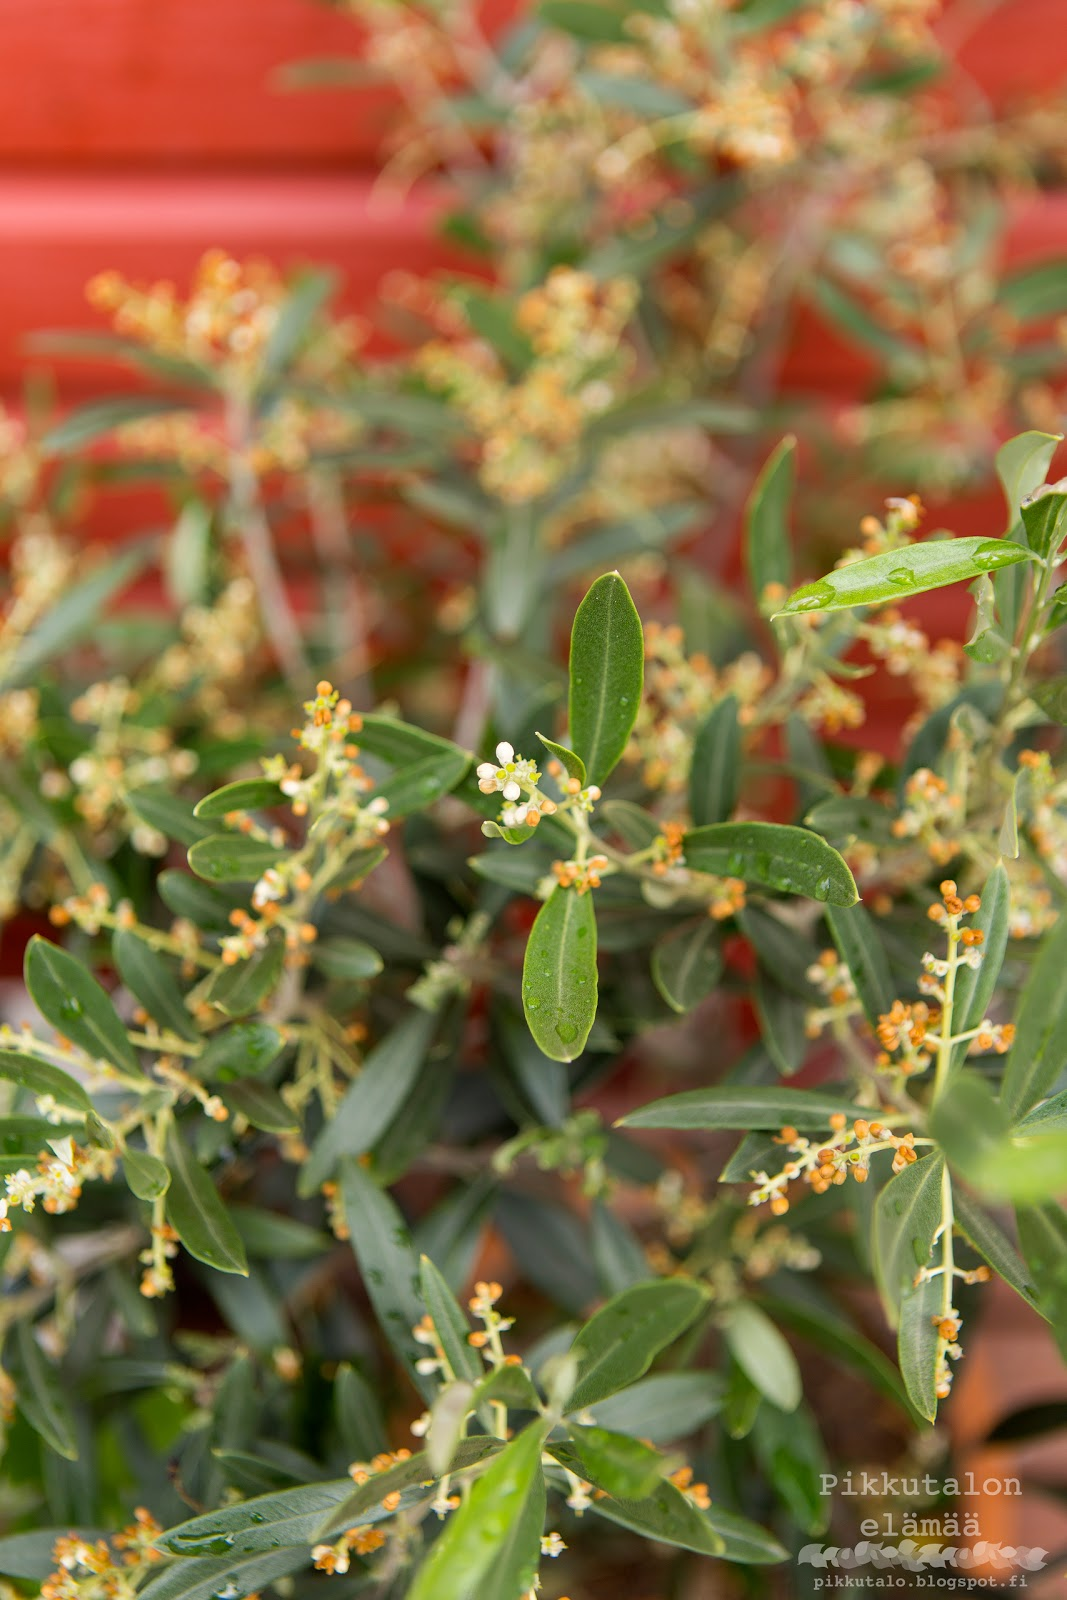 oliivipuu kukkii Suomessa